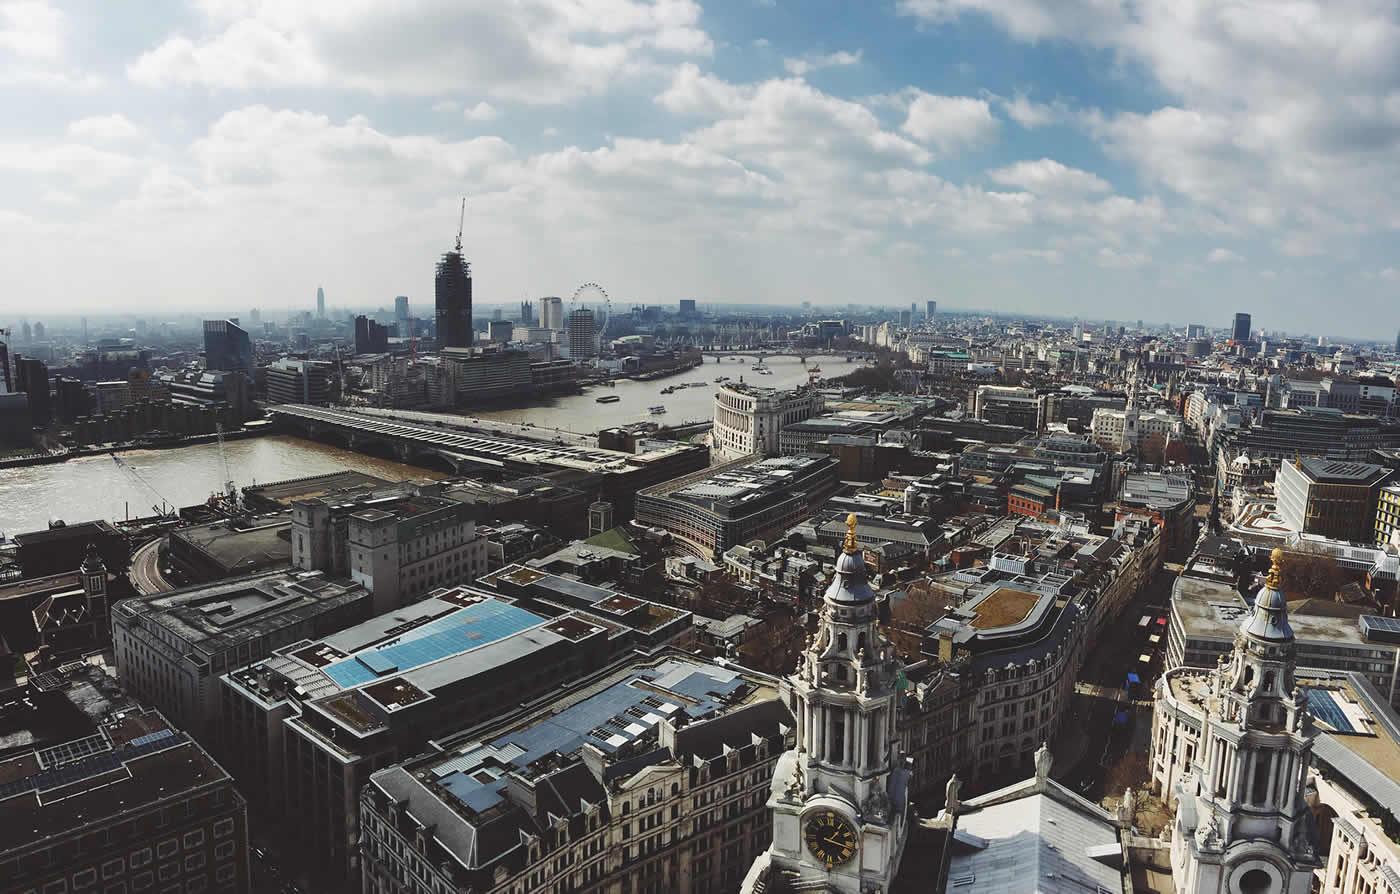 City scape of London, UK